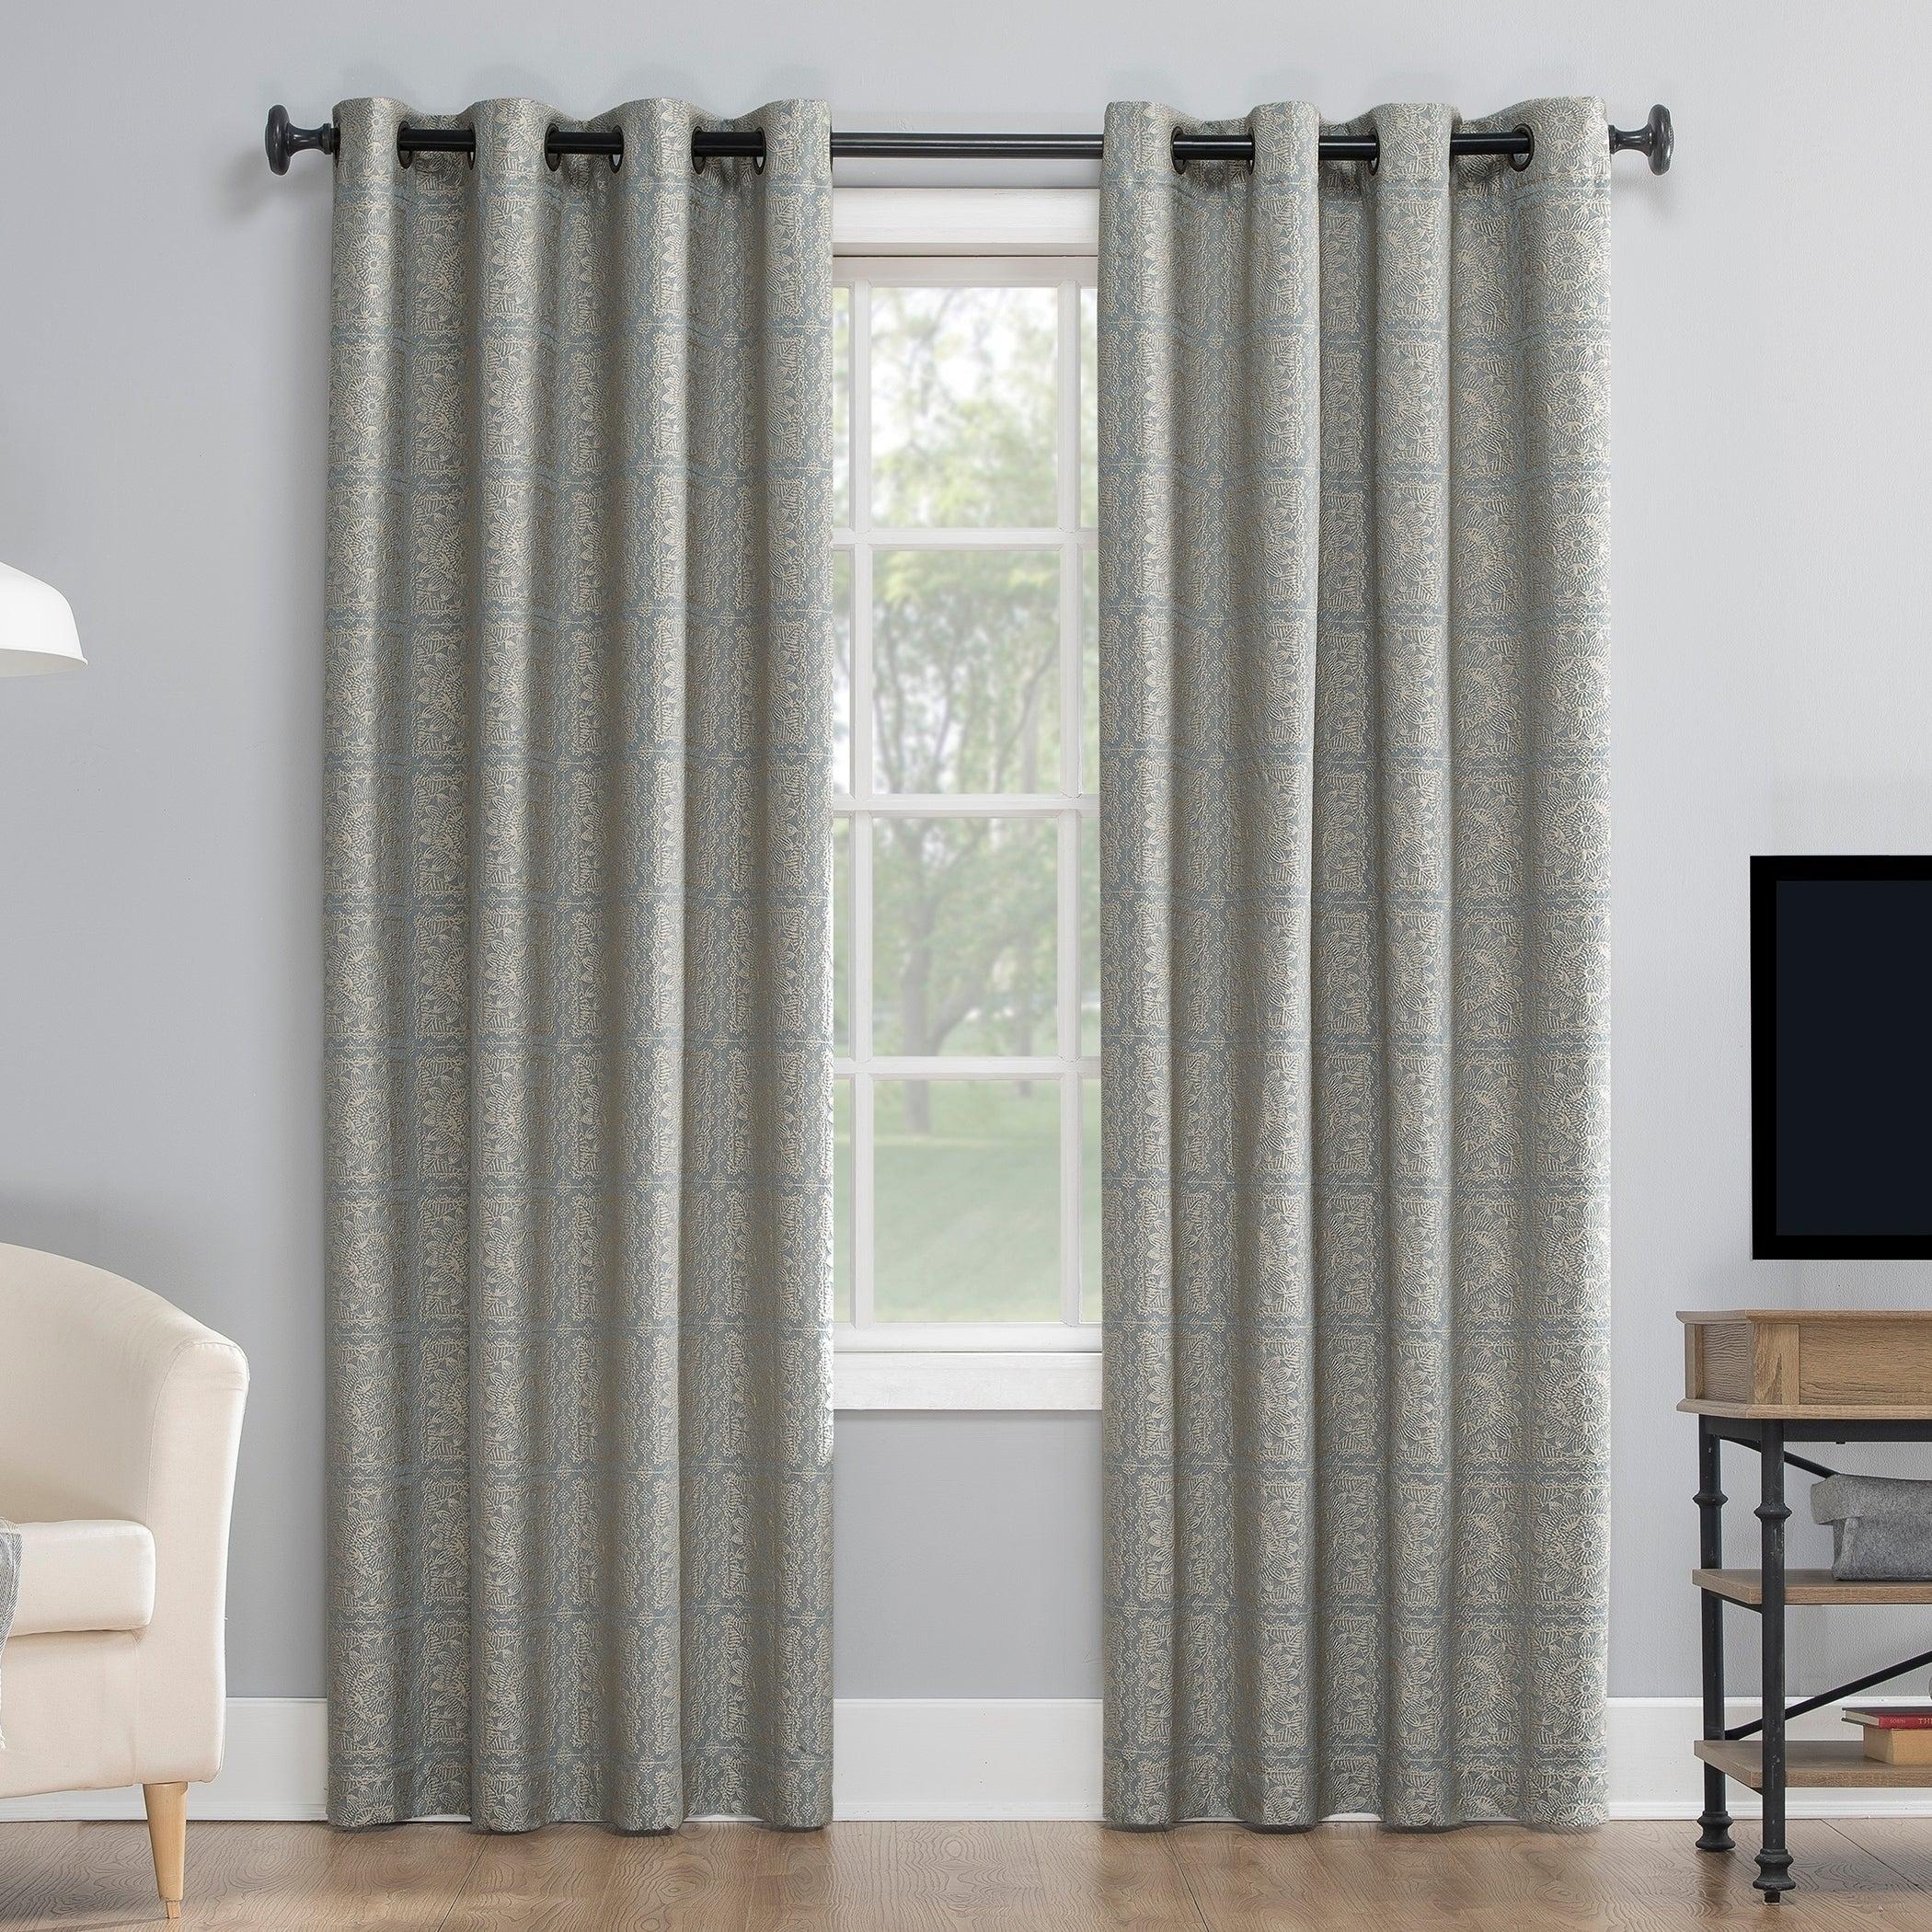 Sun Zero Evie Medallion Jacquard Extreme 100% Blackout Grommet Curtain Panel For Luxury Collection Faux Leather Blackout Single Curtain Panels (View 19 of 20)